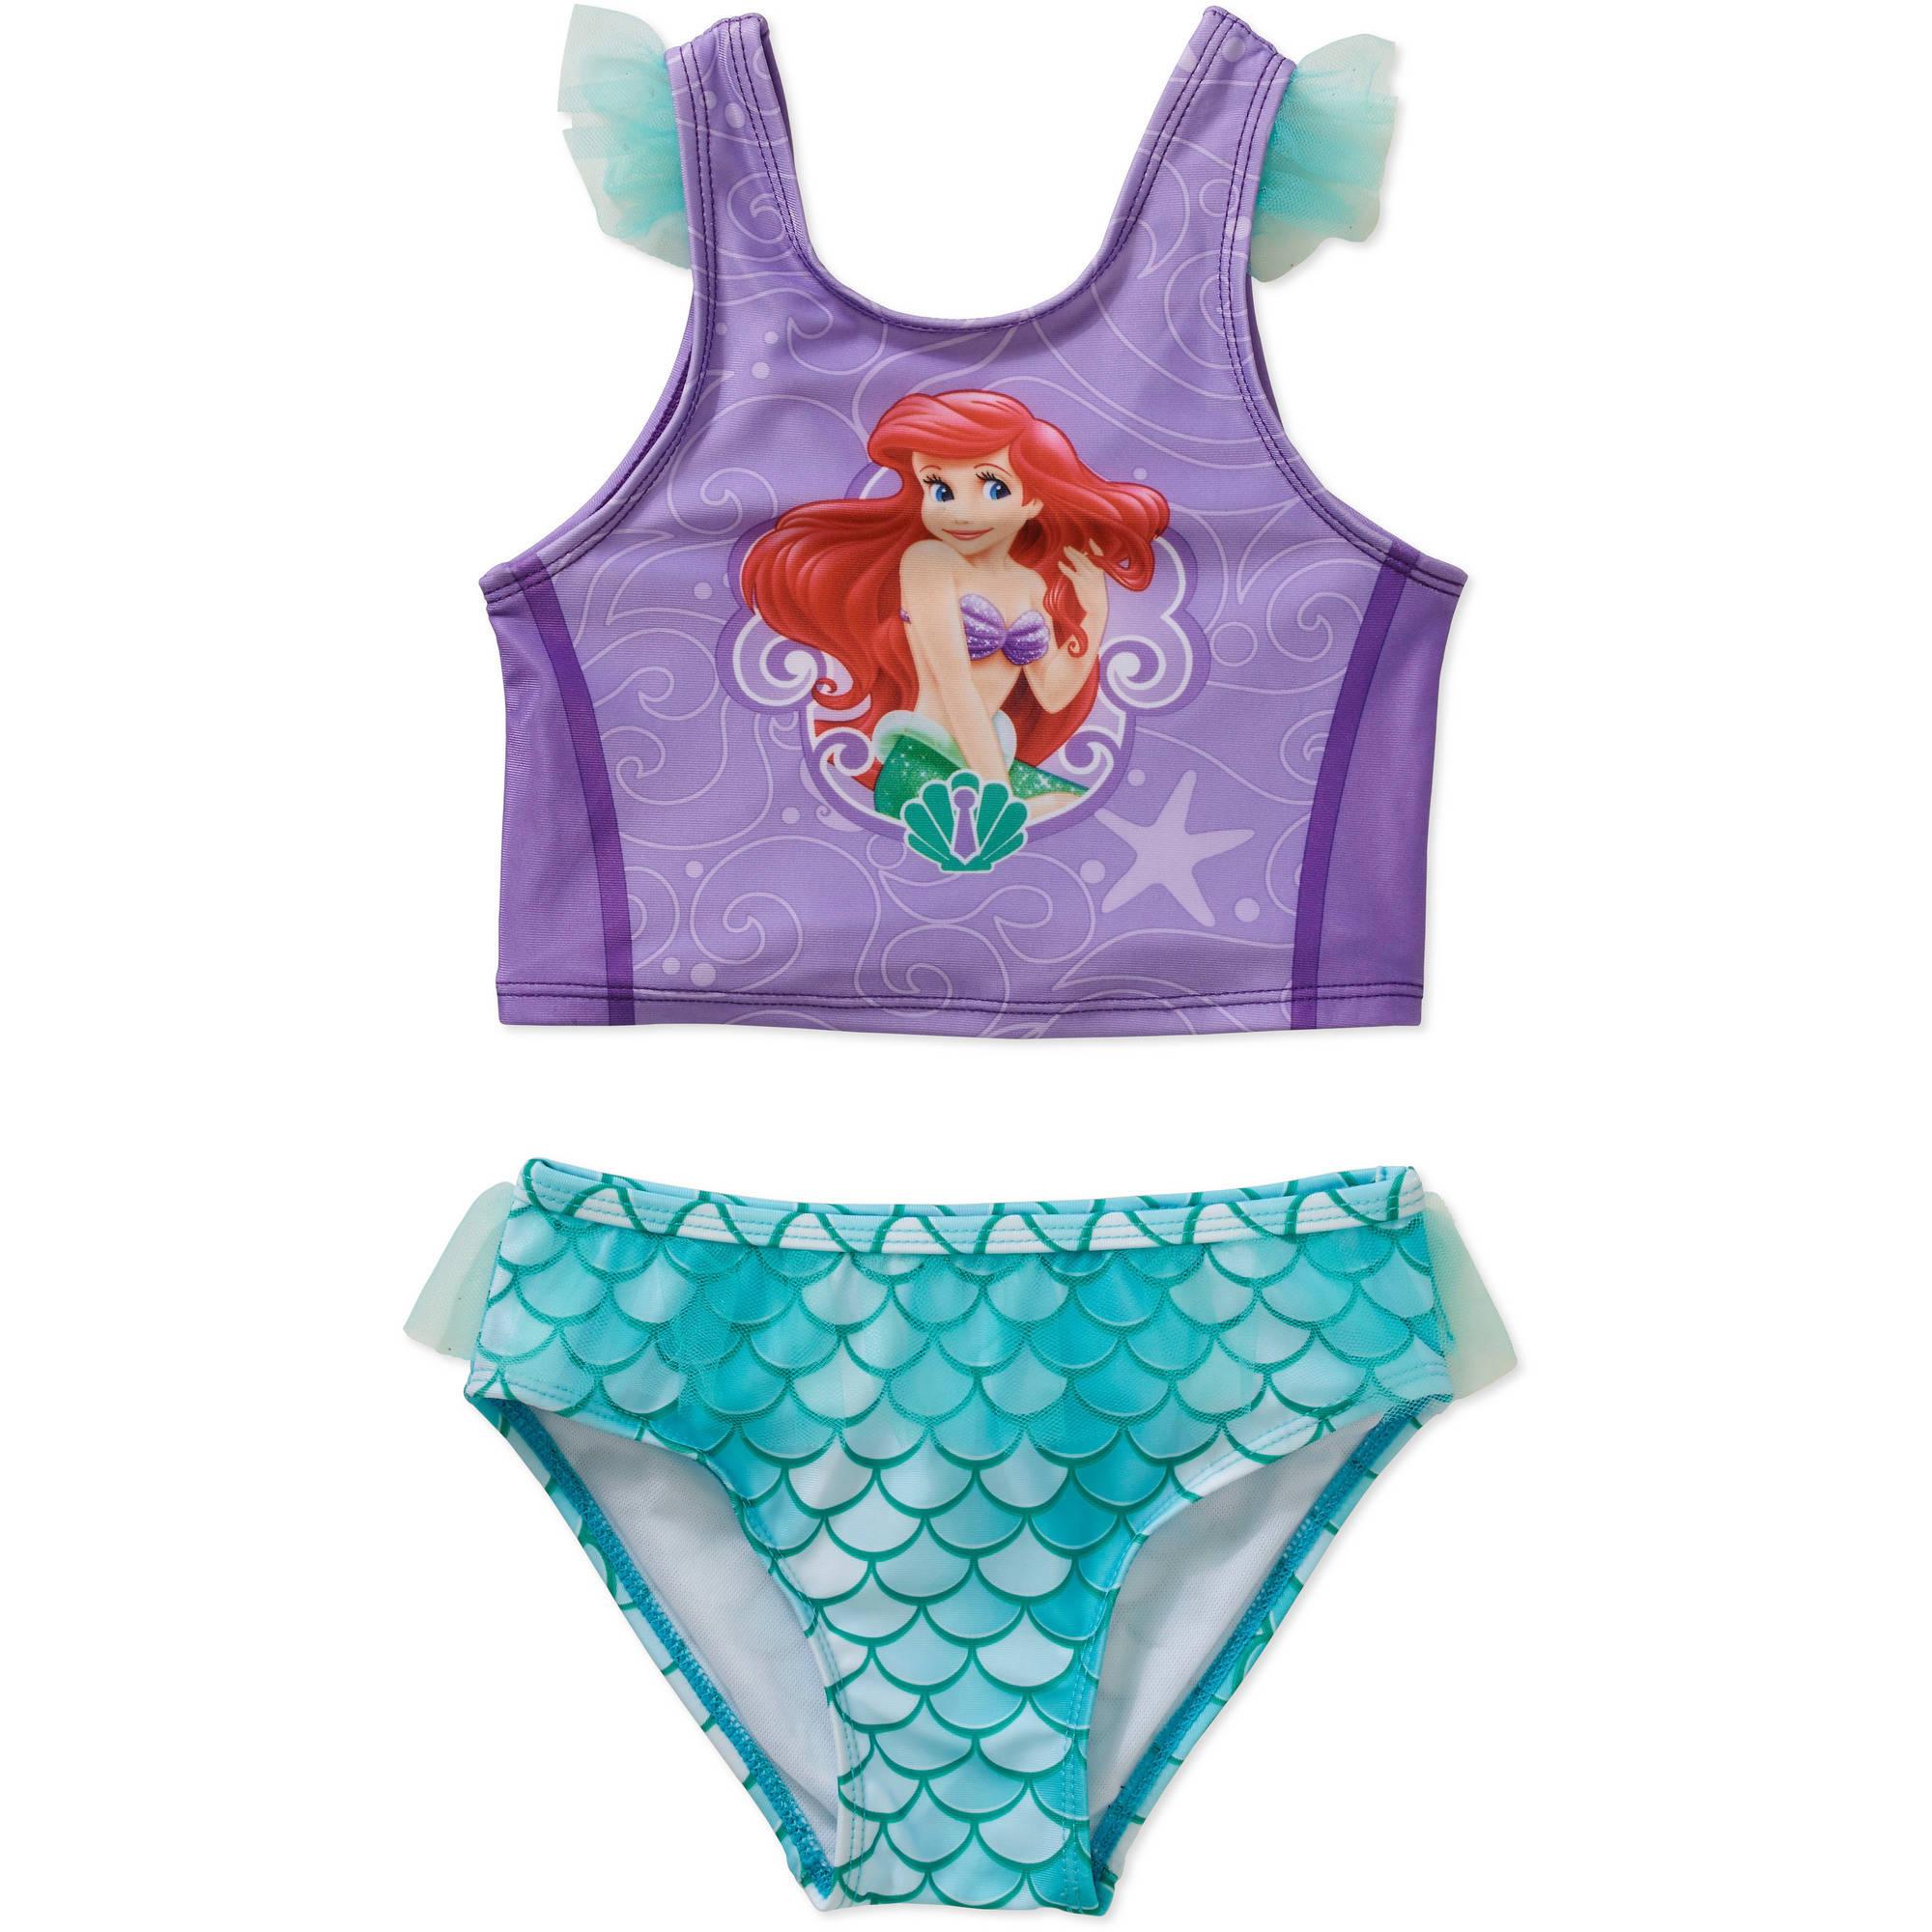 cb425dc332 Disney Princess - Disney Little Mermaid Ariel Toddler Girl Tankini ...